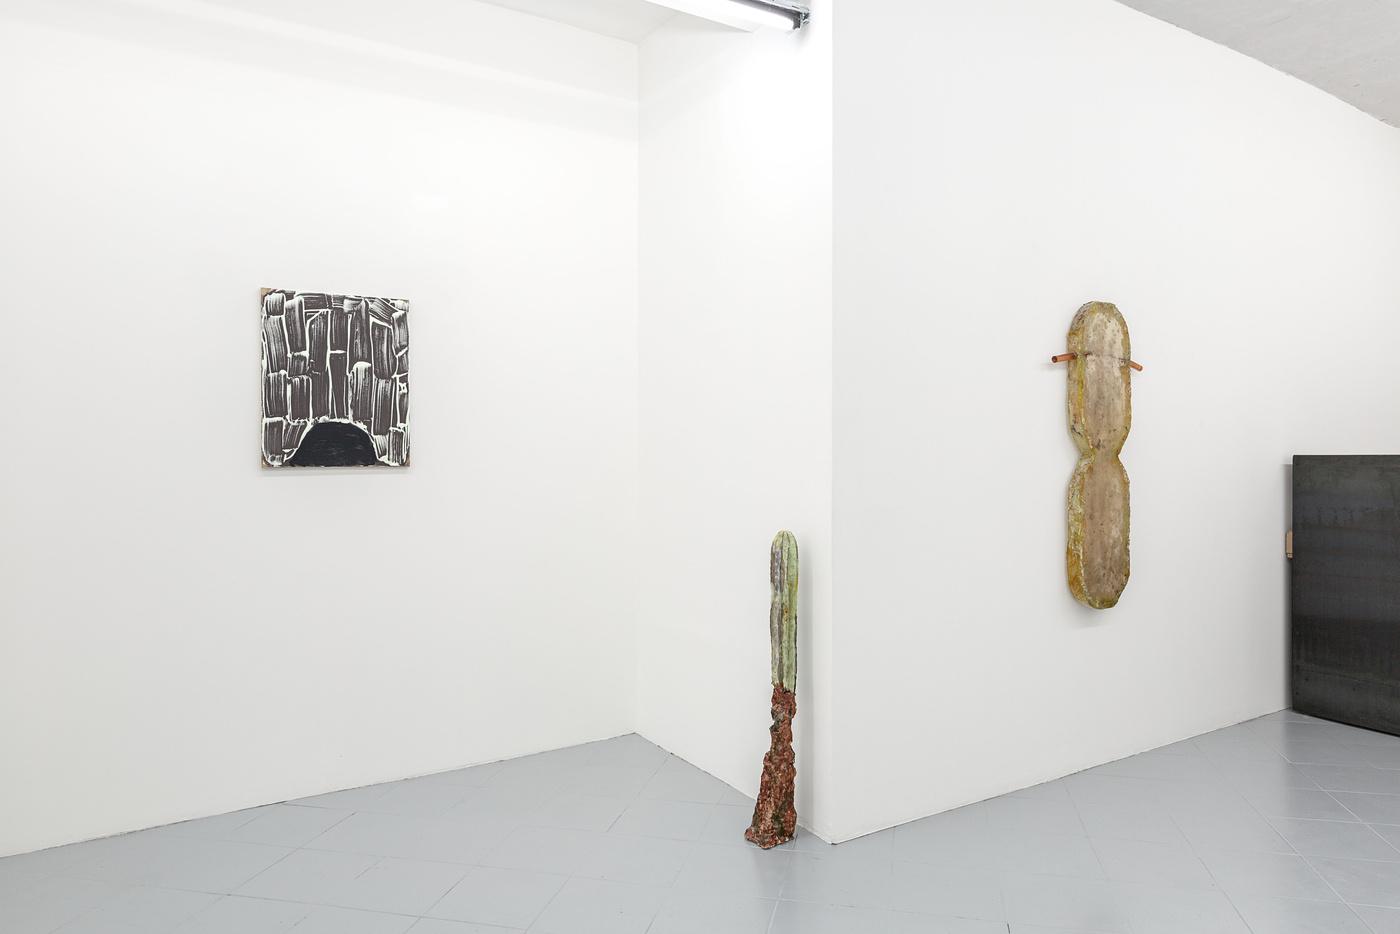 Rebranding Floes - Galerie Pauchant-6738